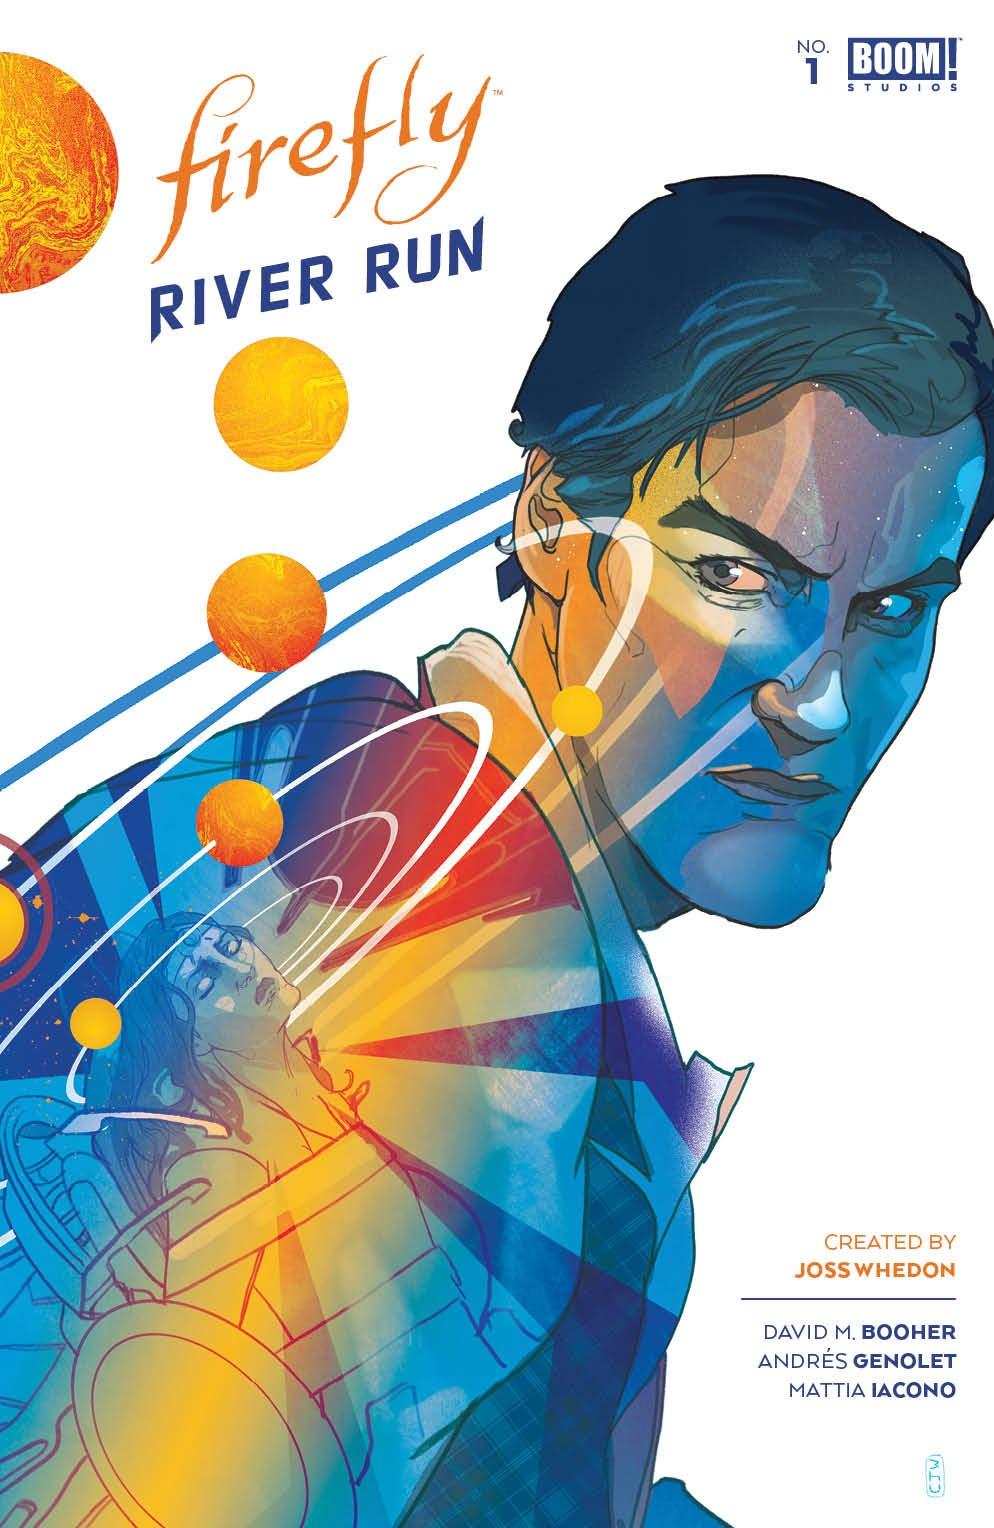 Firefly_RiverRun_001_Cover_A_Main ComicList Previews: FIREFLY RIVER RUN #1